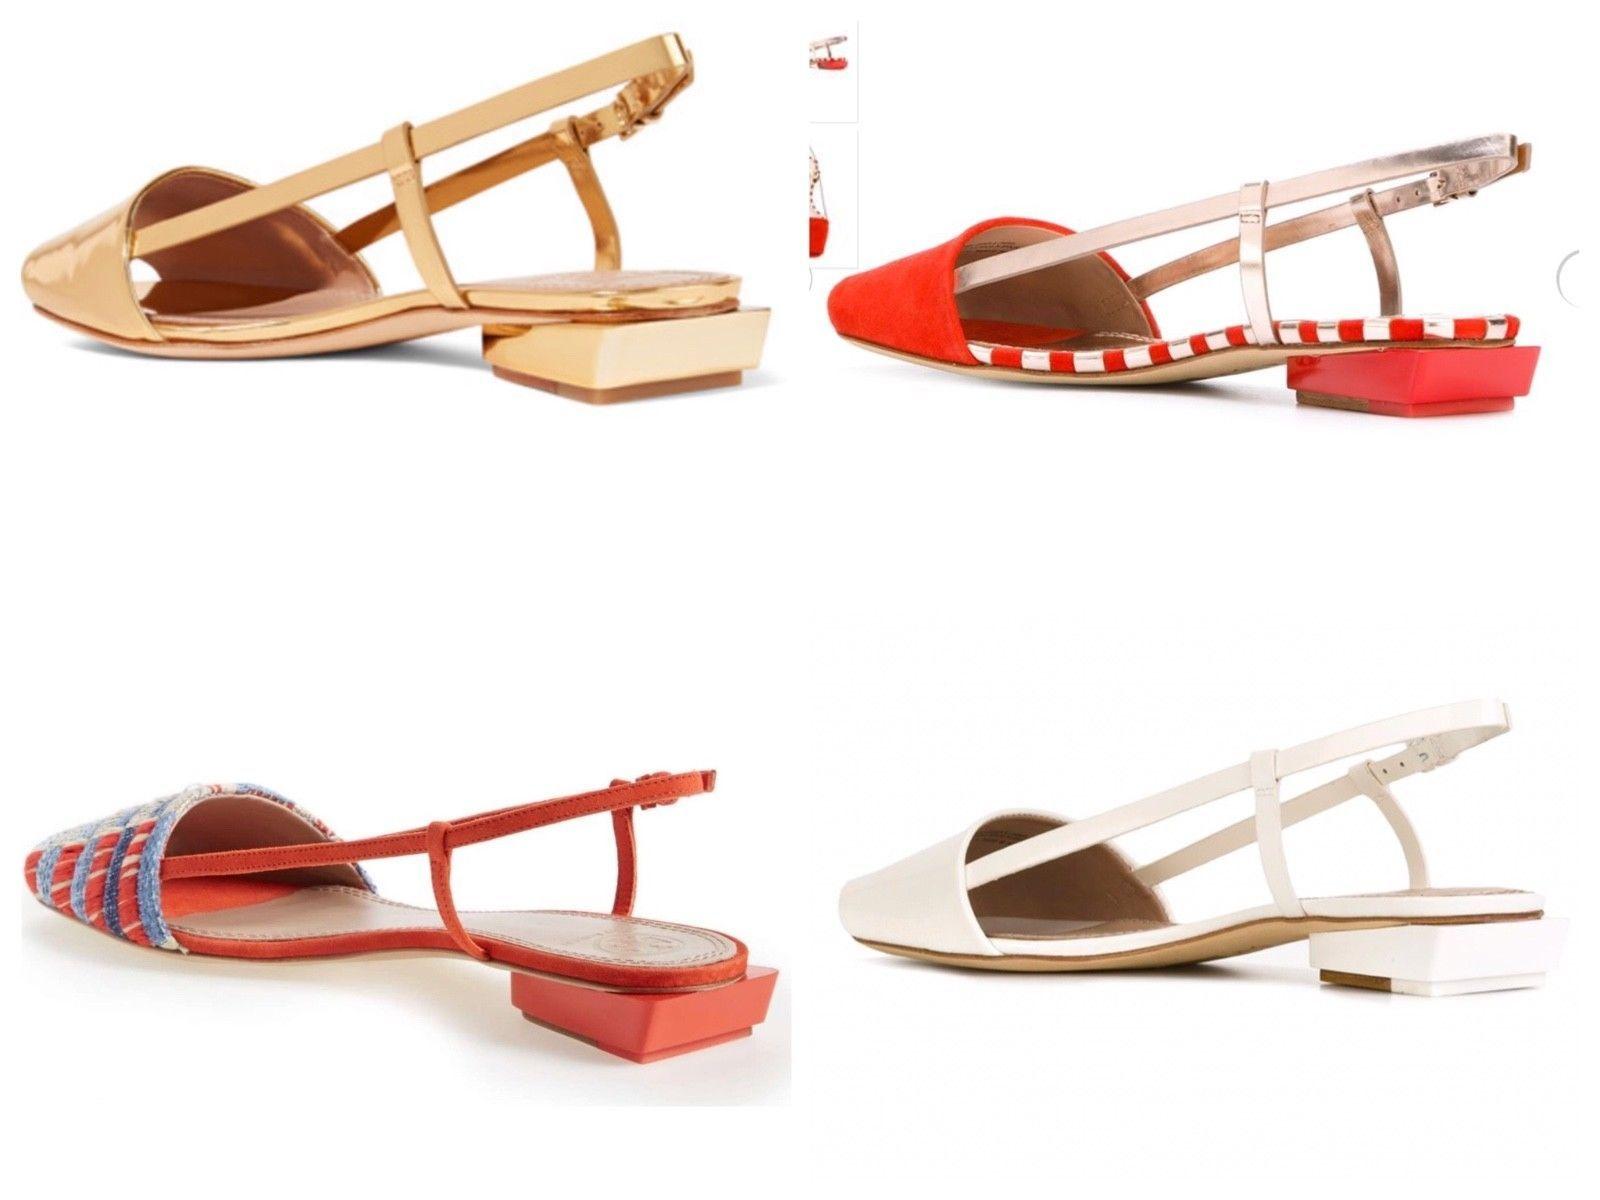 Tory Burch Pietra Leather Runway Flat Sandal Retail: $350